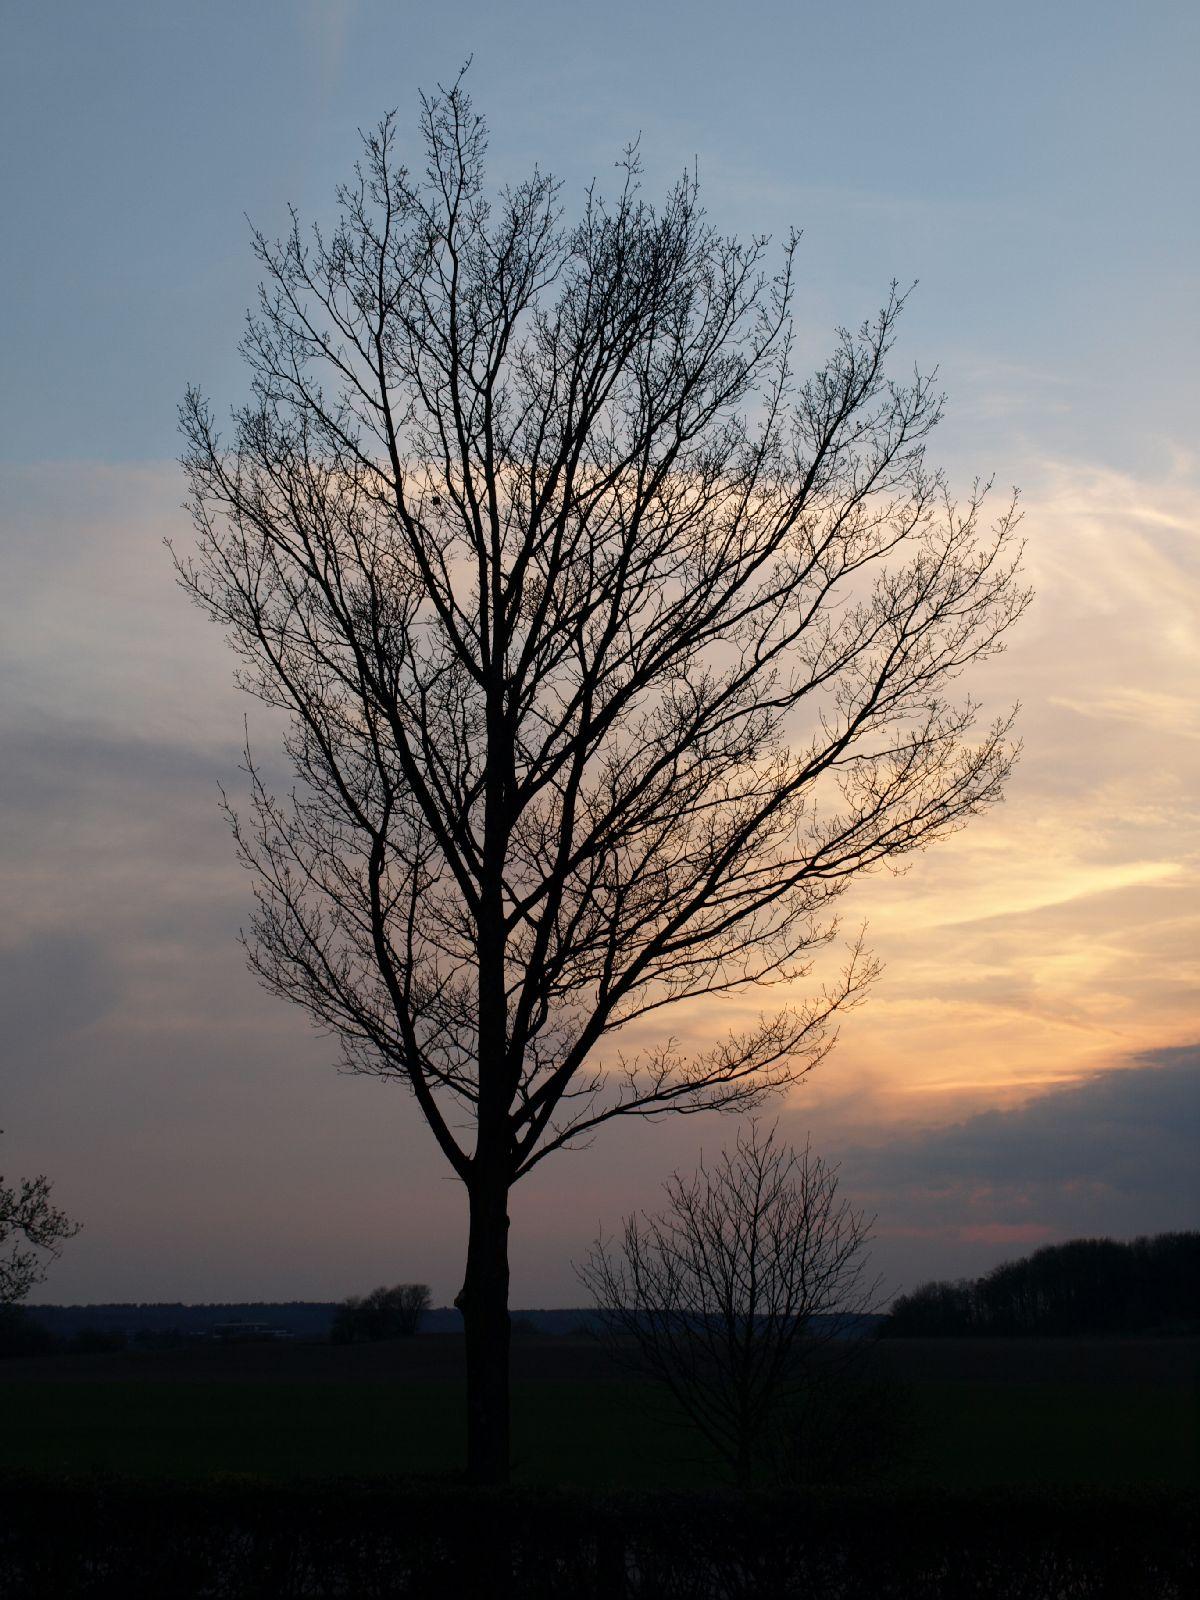 Pflanzen-Baum-Silhouette-Foto_Textur_B_P4171371